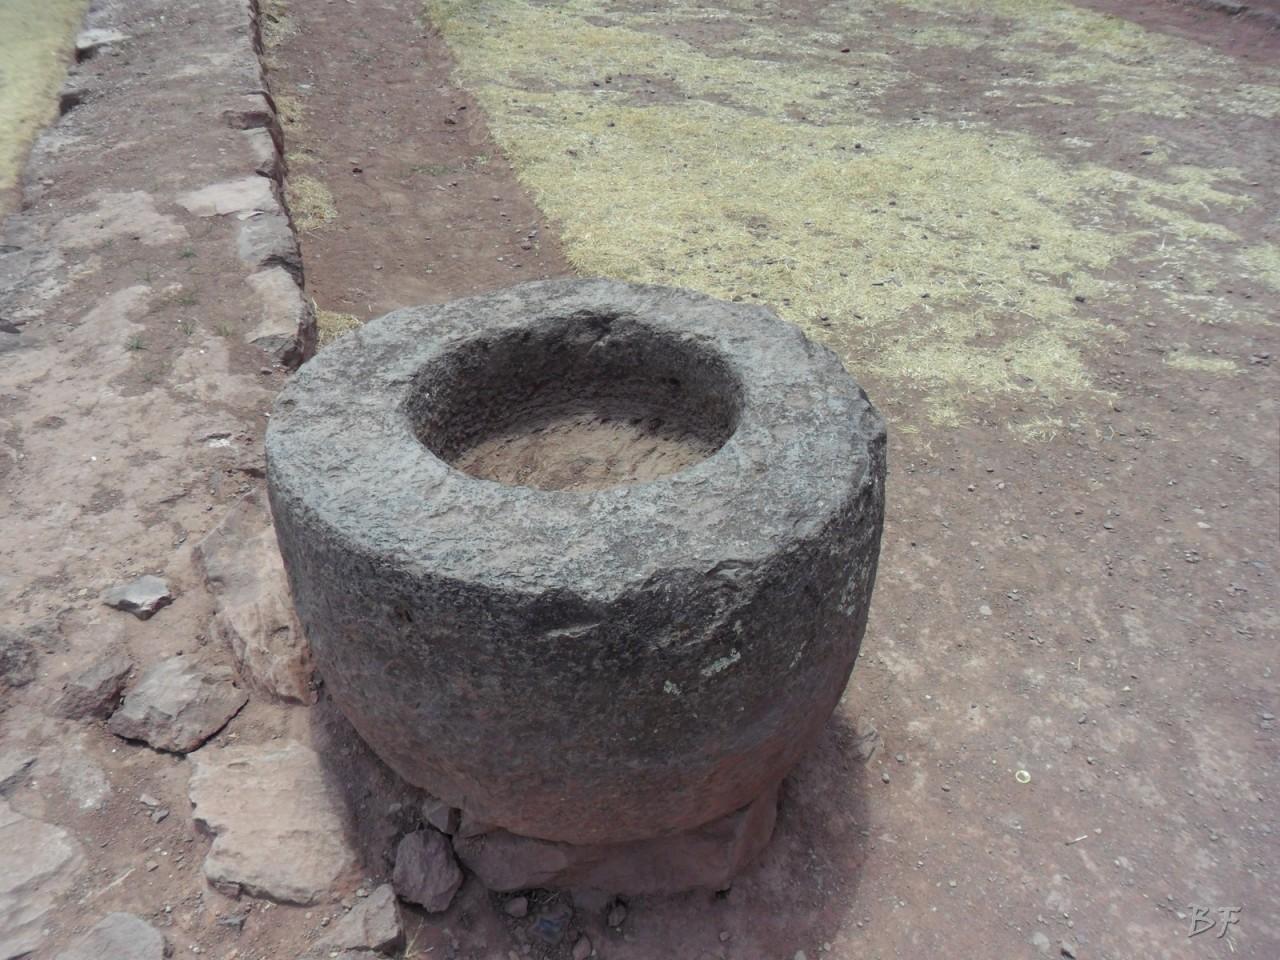 Parco-Archeologico-Megaliti-Rumicolca-Cusco-Perù-4